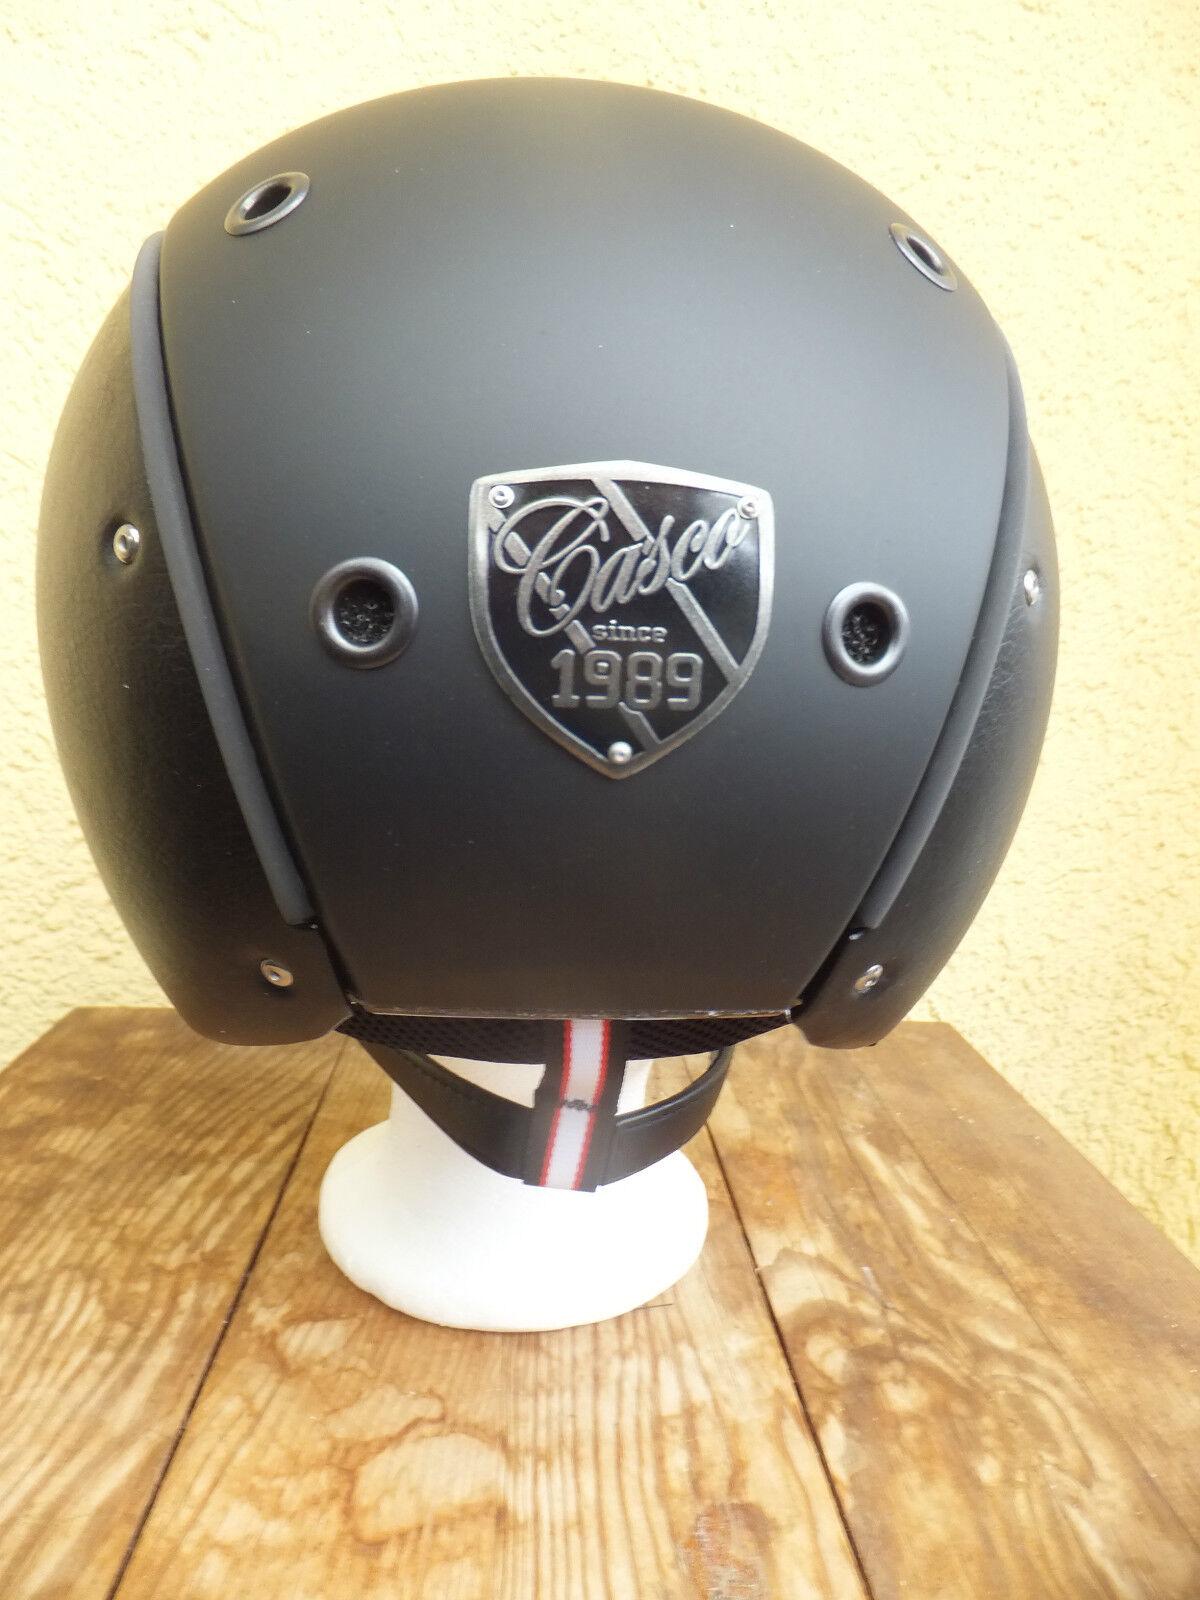 CASCO spirit-6 Reithelm schwarz Glattleder Glattleder schwarz VG1.01 Siegel  Modell 2015 1338c4